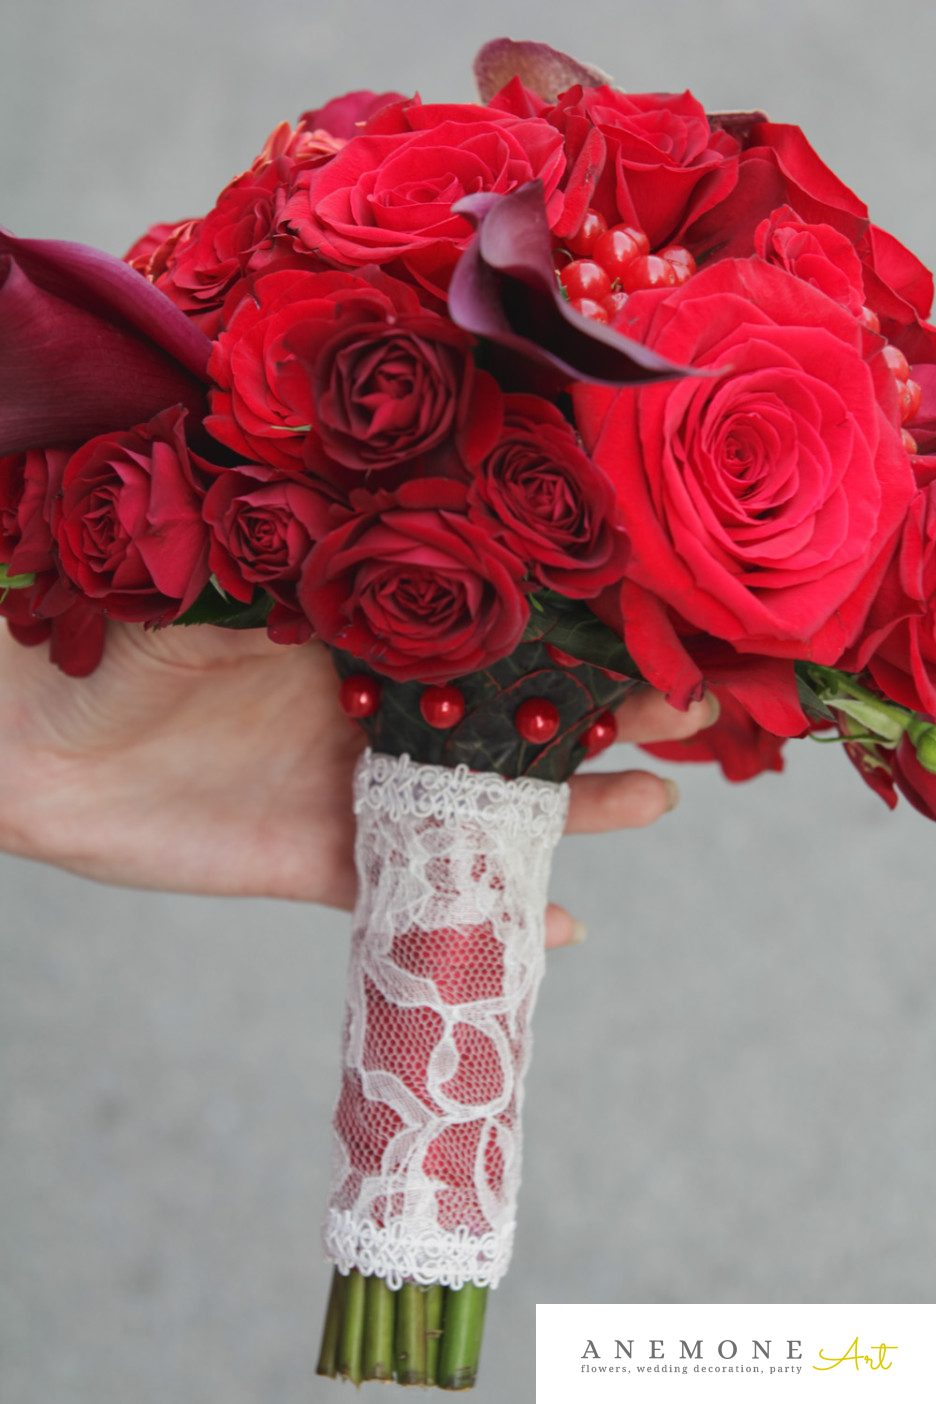 Poza, foto cu Flori de nunta buchet mireasa, calla, maner buchet, orhidee, rosu, trandafiri, vanda, visiniu in Arad, Timisoara, Oradea (wedding flowers, bouquets) nunta Arad, Timisoara, Oradea